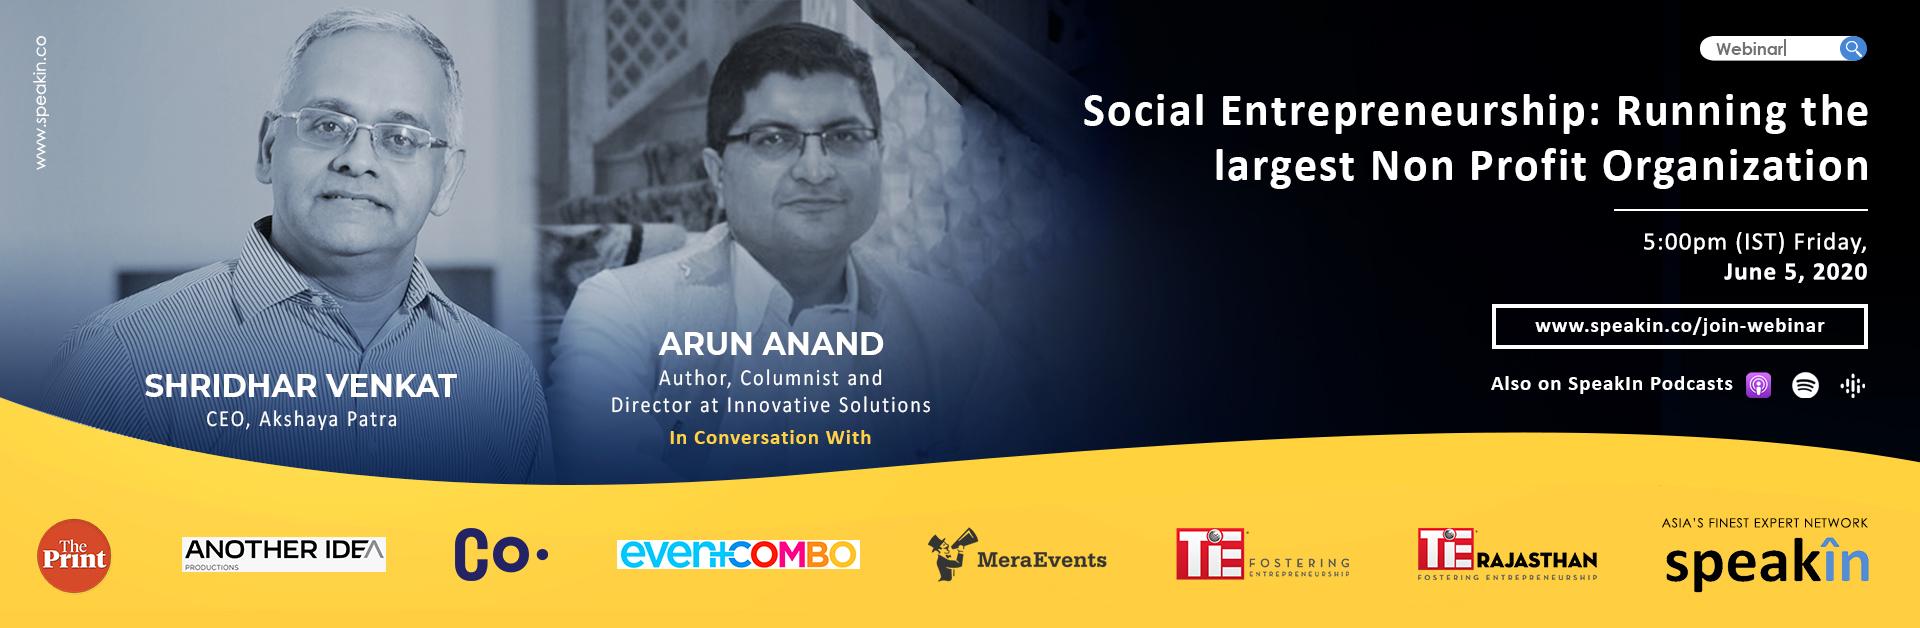 Social Entrepreneurship: Running the largest Non Profit Organization